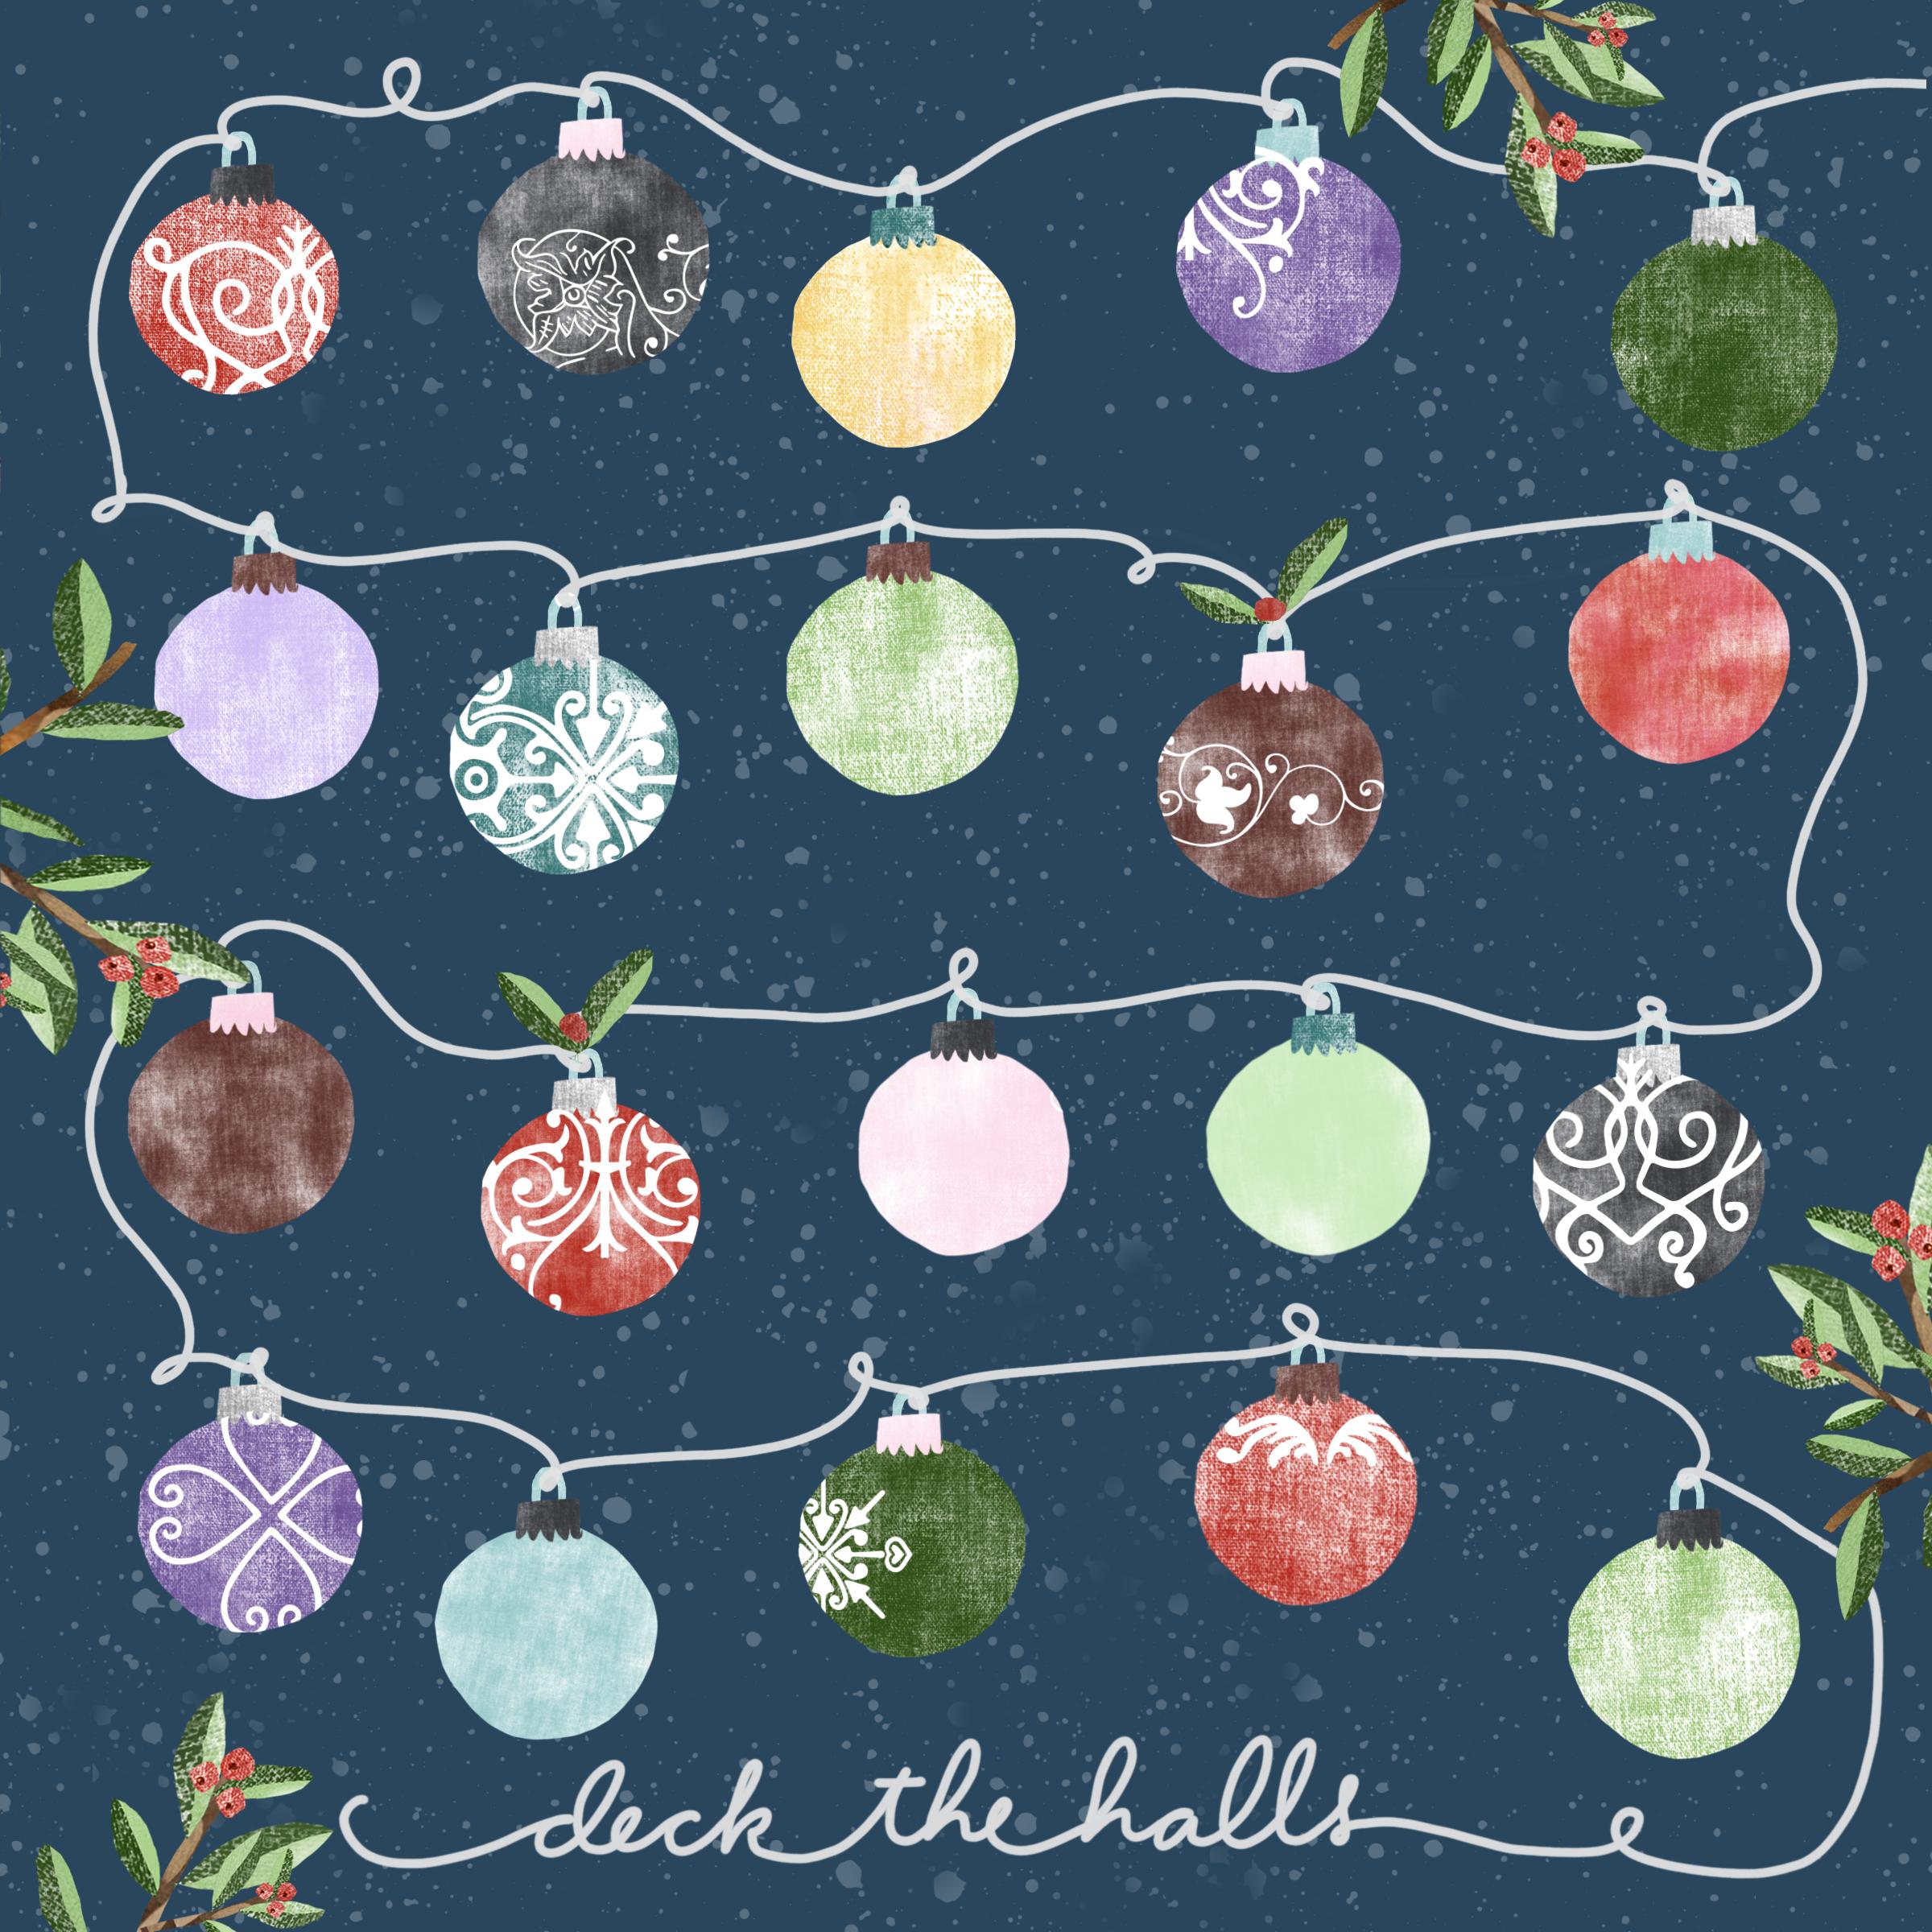 Deck_The_Halls-blue-with-specks.jpg